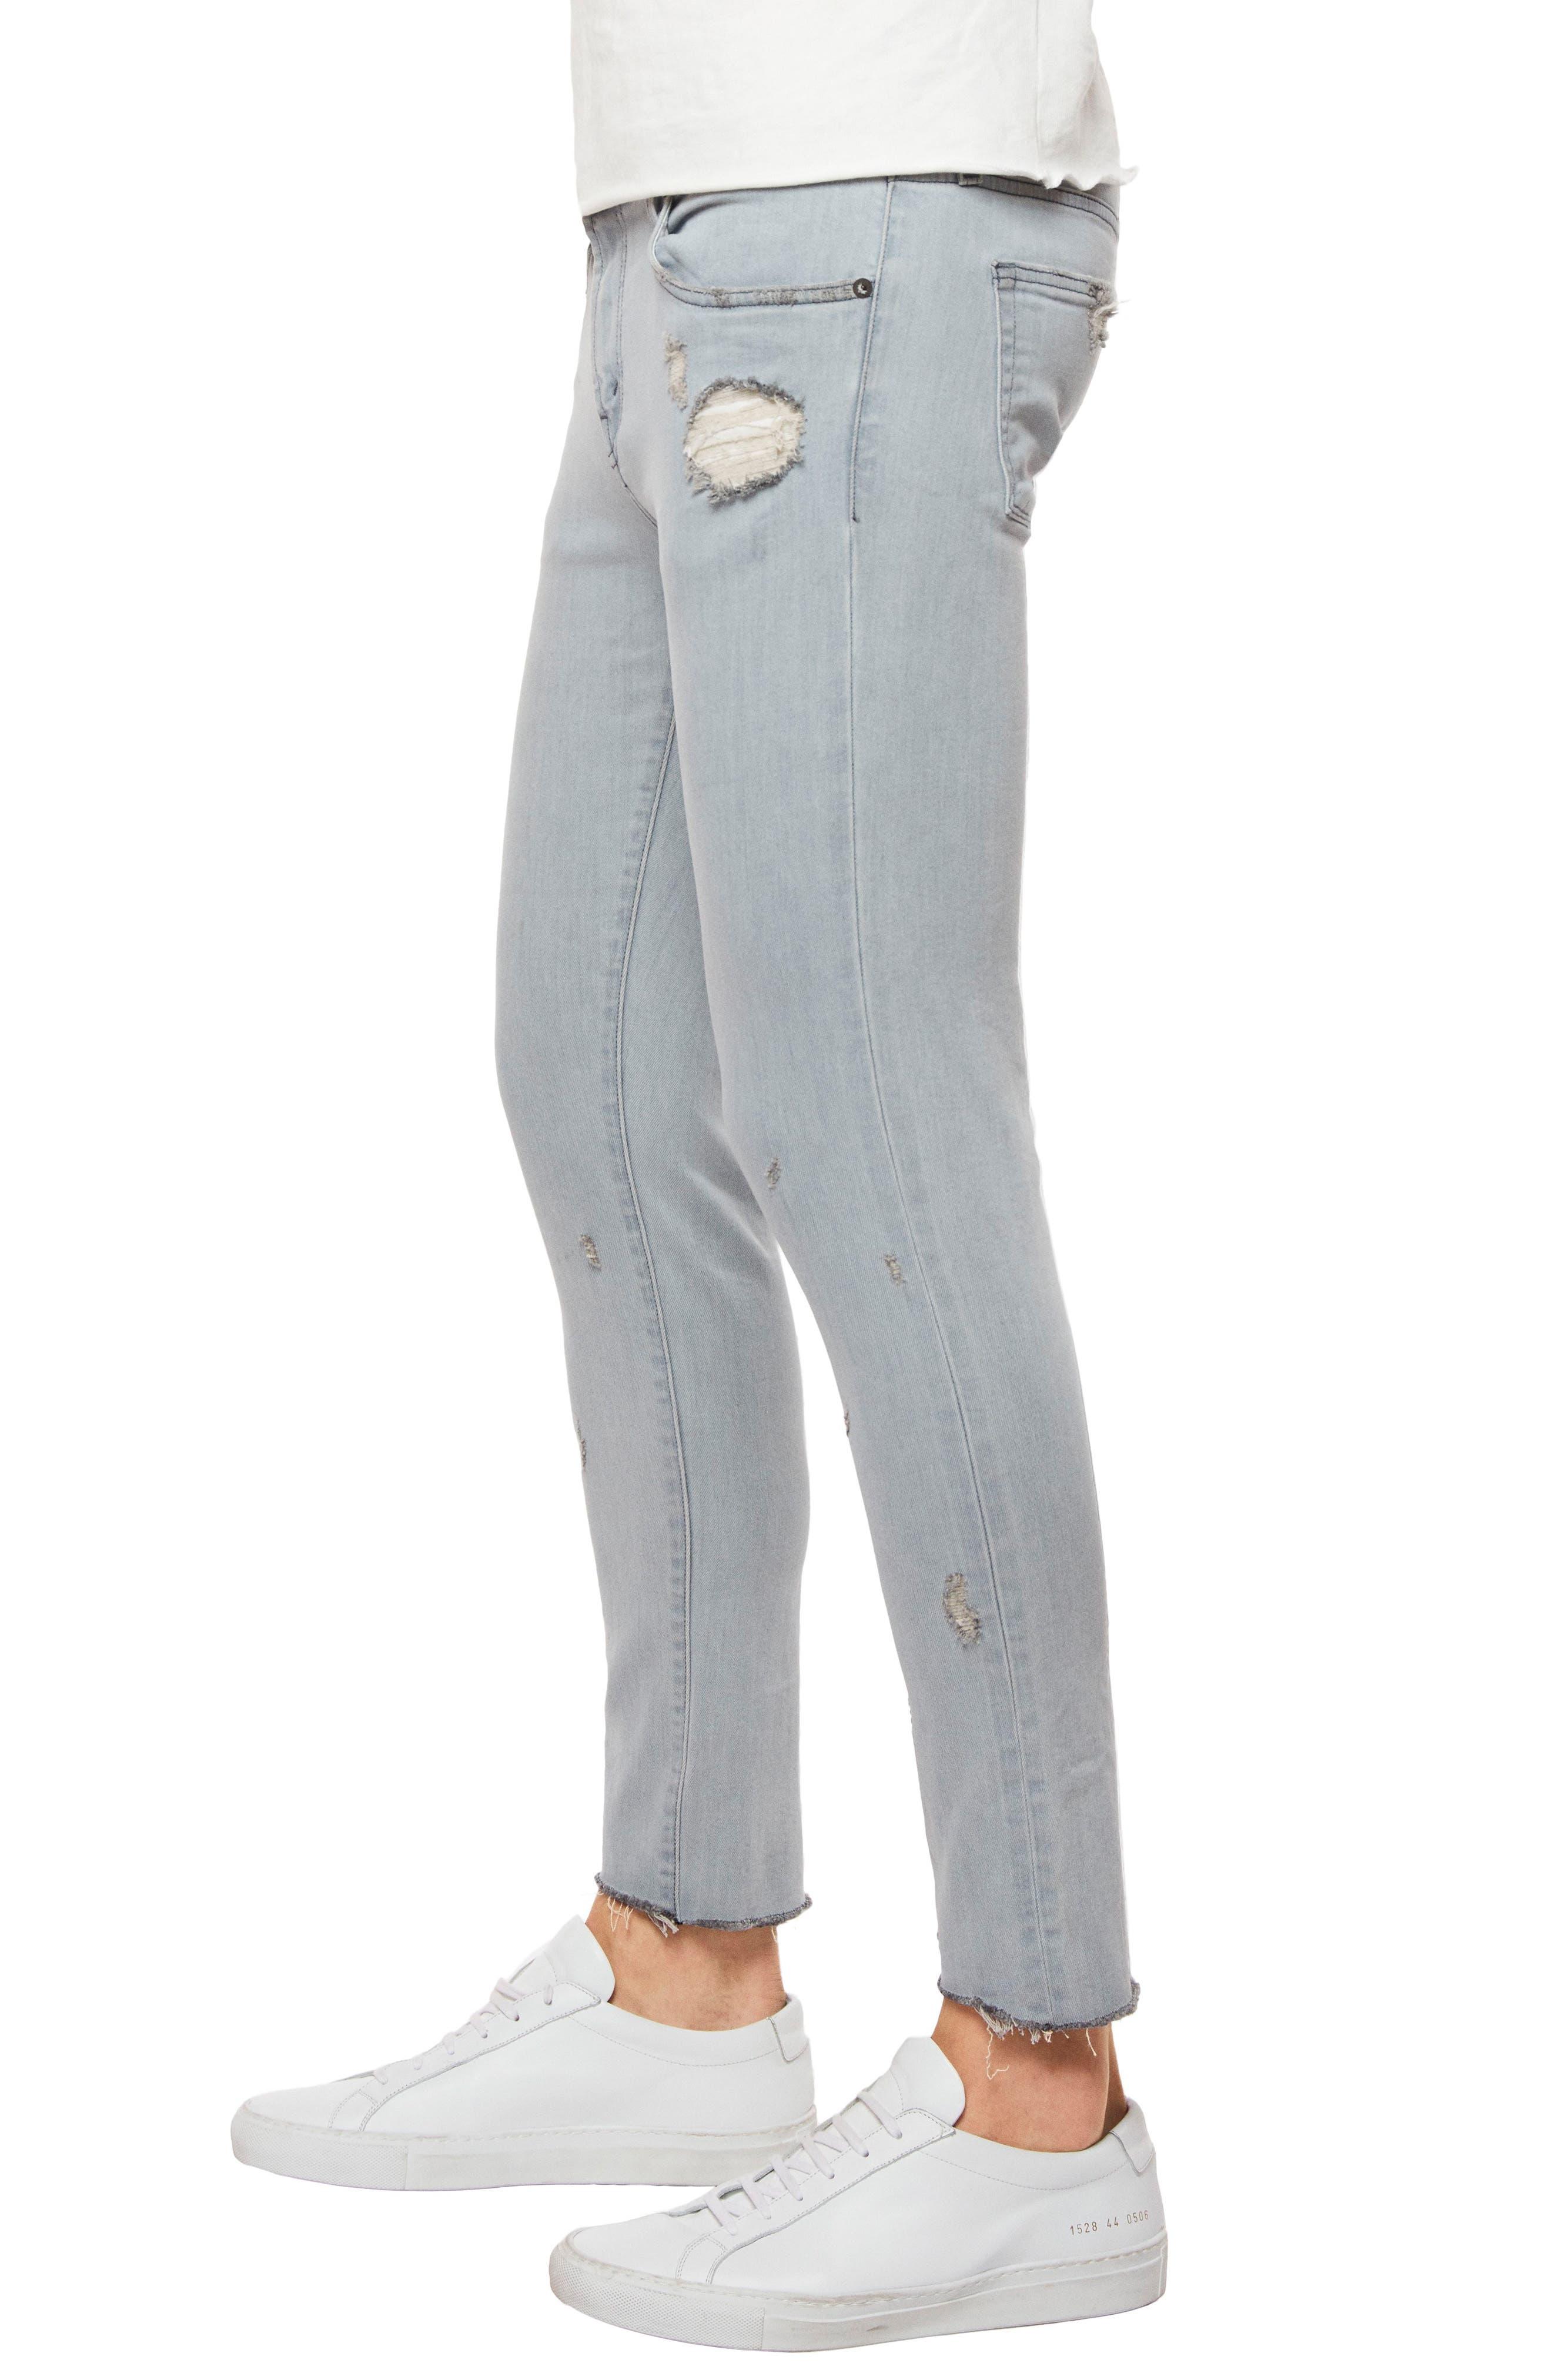 Tyler Slim Fit Jeans,                             Alternate thumbnail 3, color,                             Trounced Porpoise